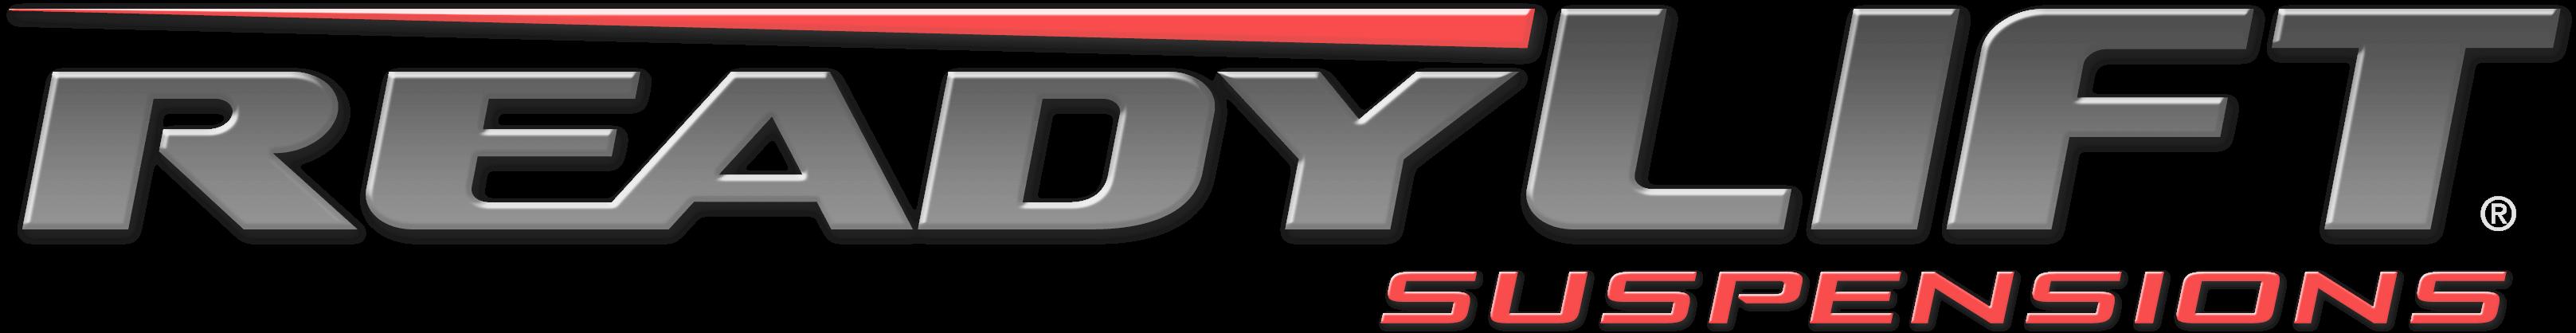 readylift logo